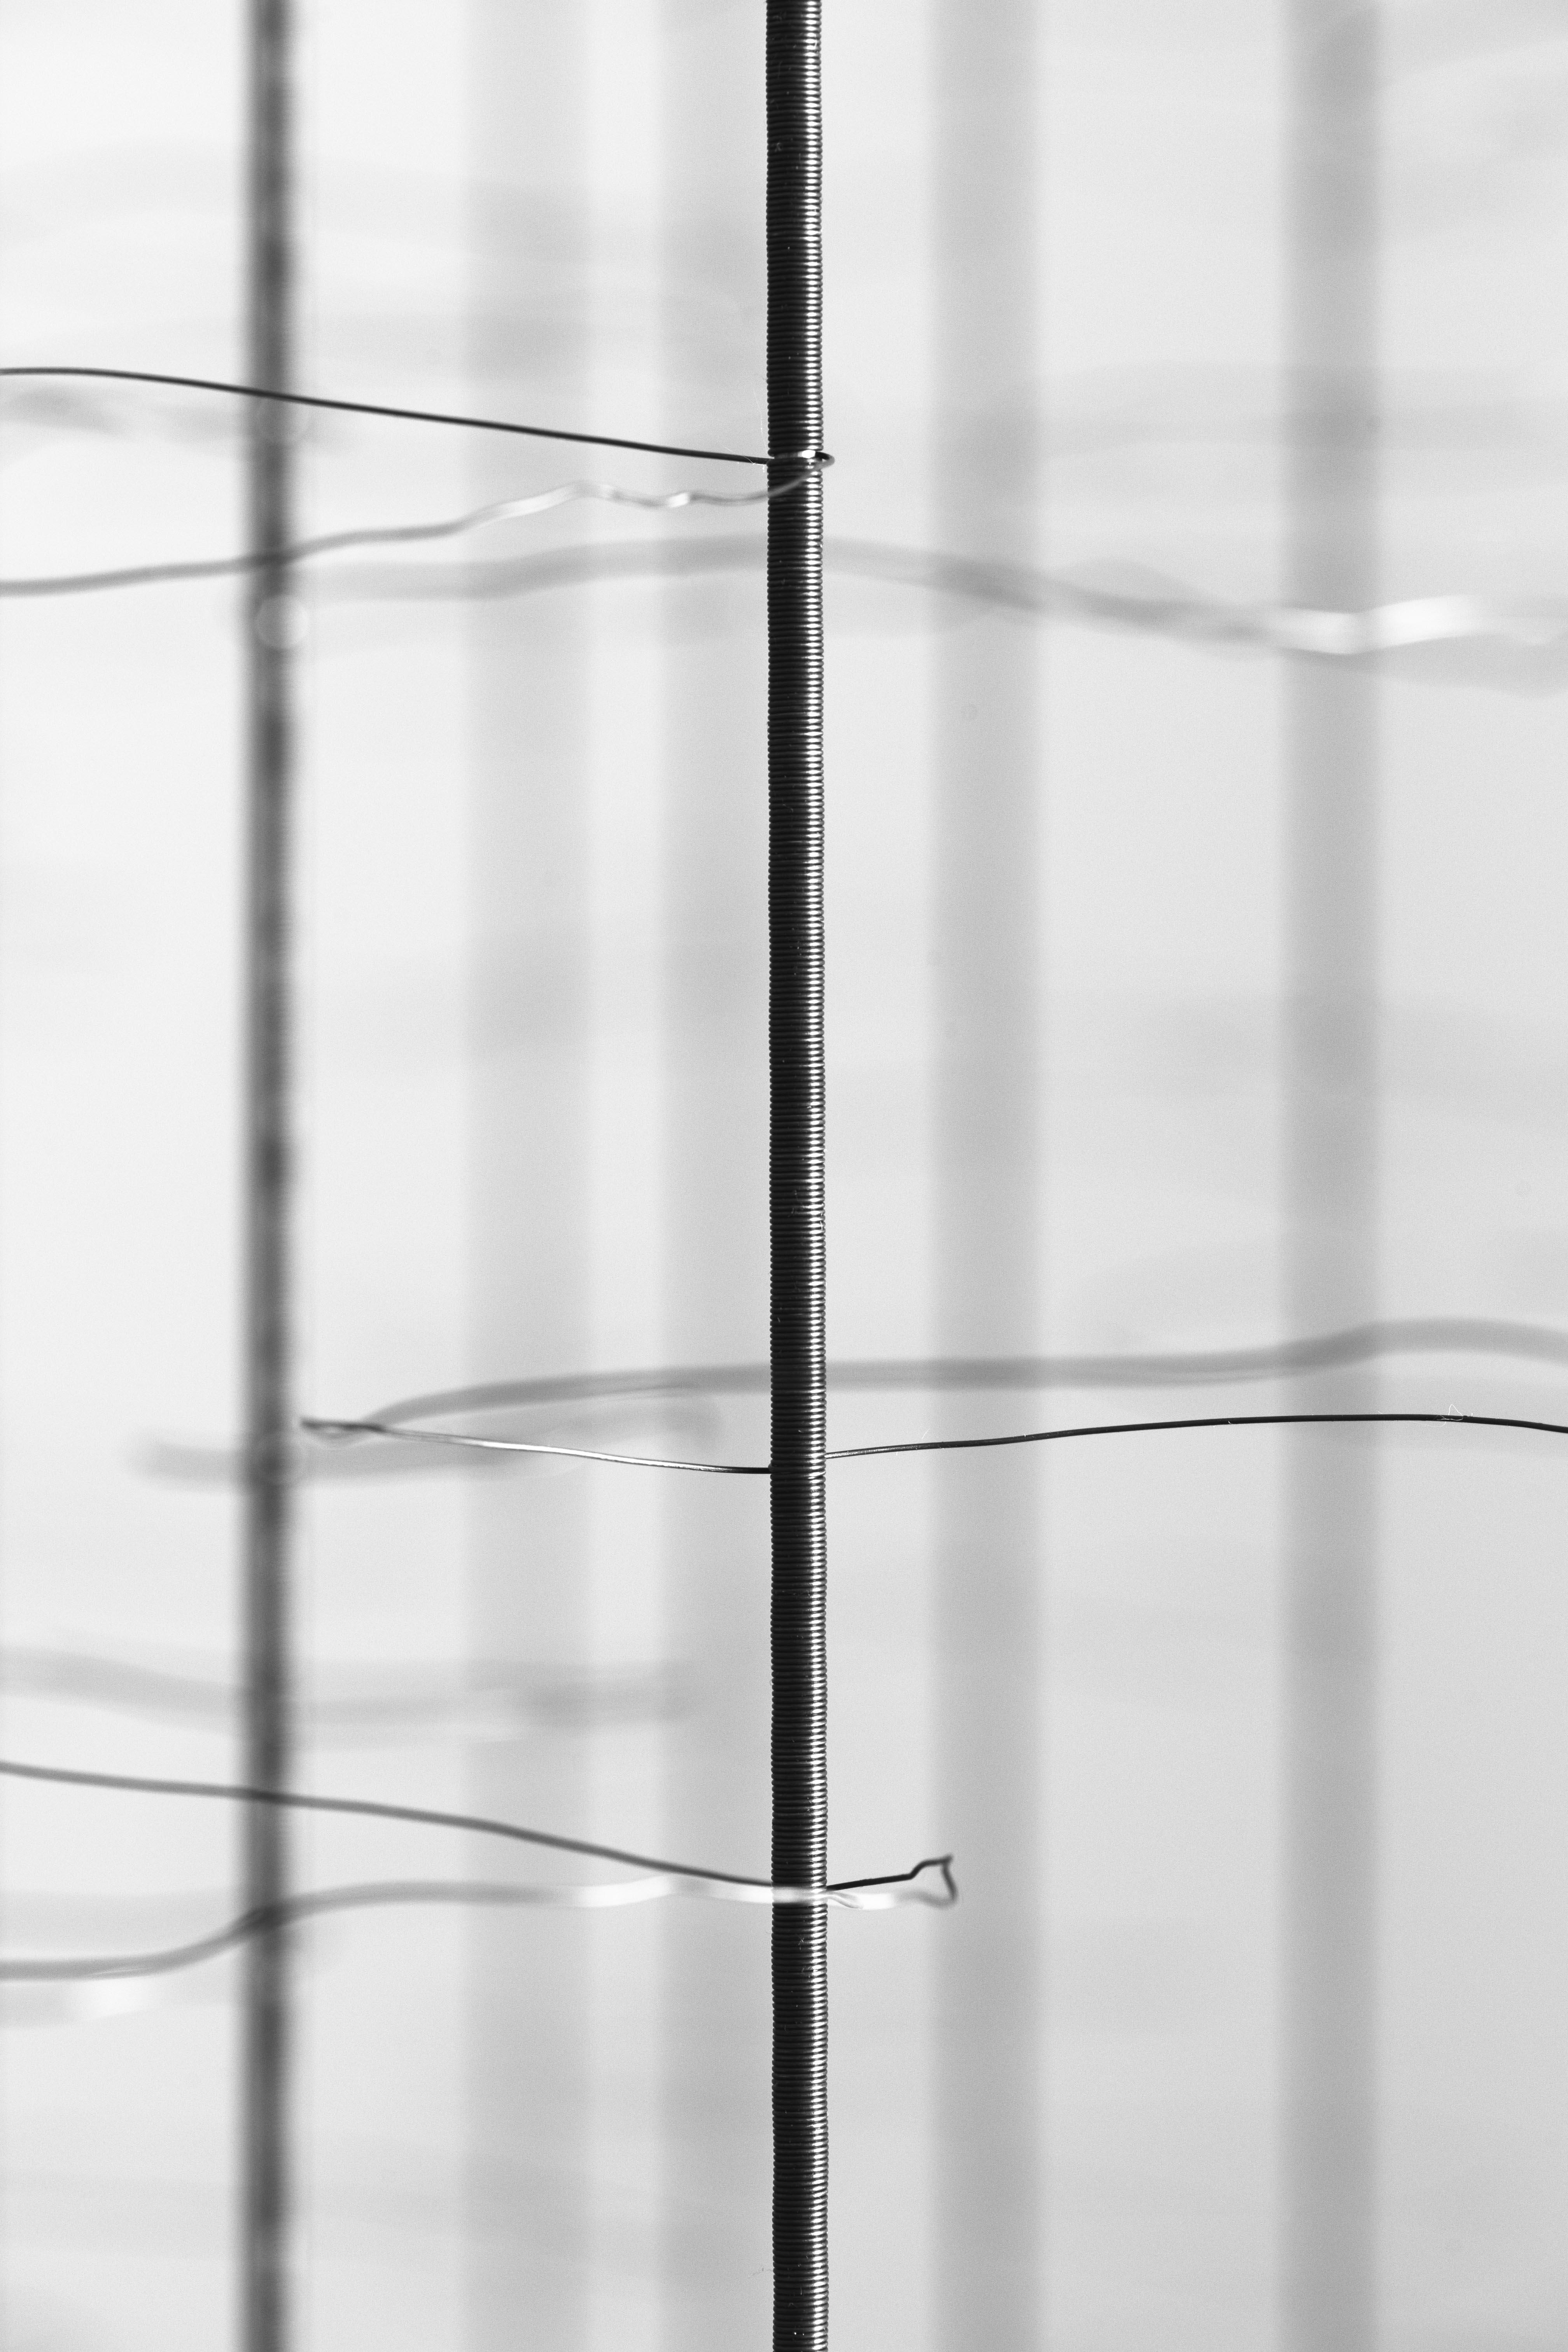 Sculpture I, 2010, detail